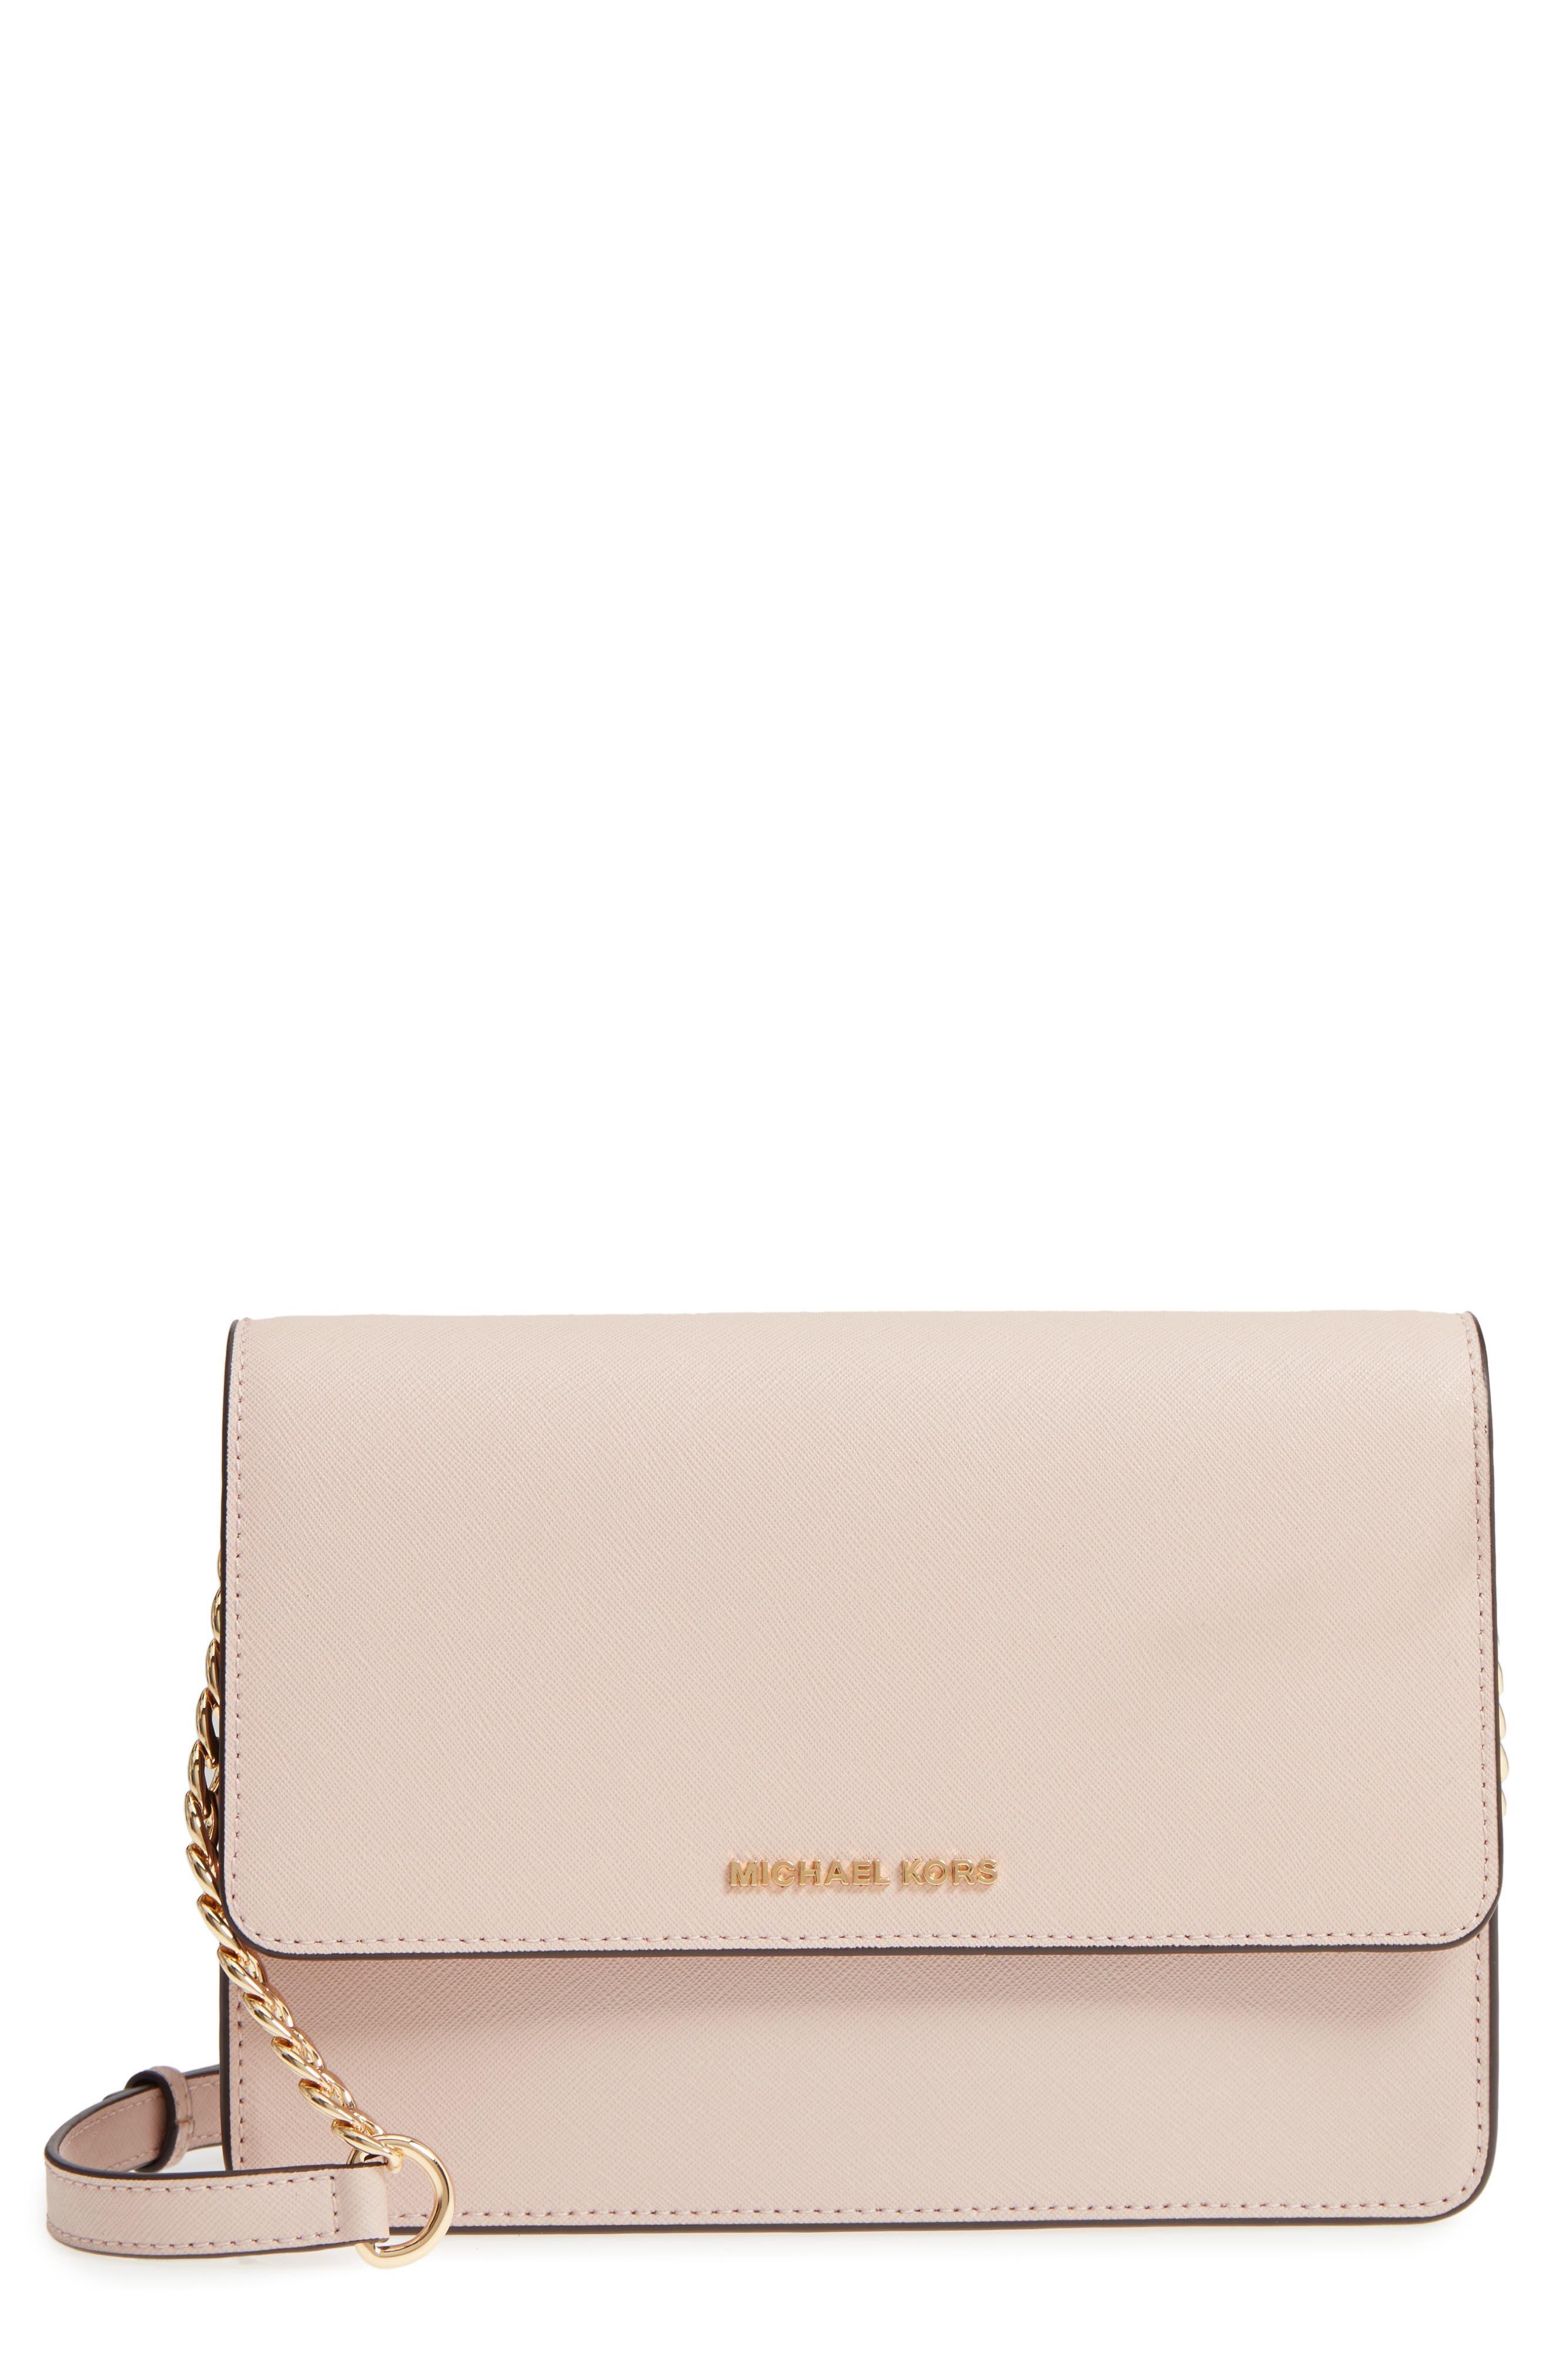 Large Daniela Leather Crossbody Bag,                             Main thumbnail 1, color,                             SOFT PINK